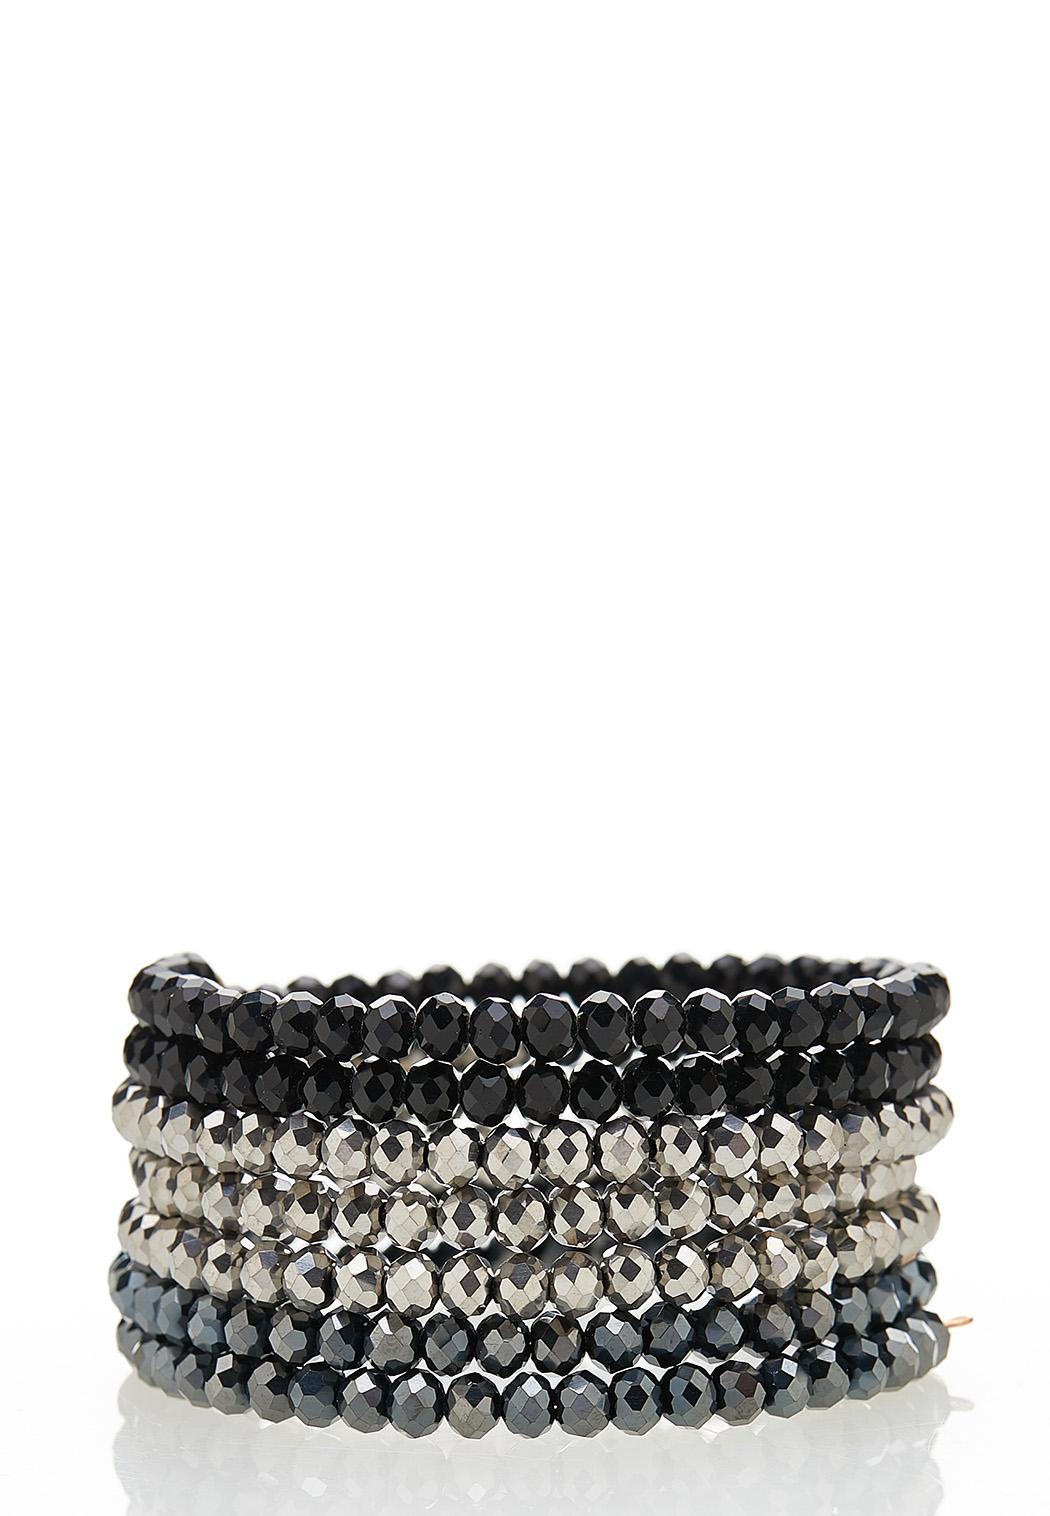 Tri-Toned Coil Bracelet